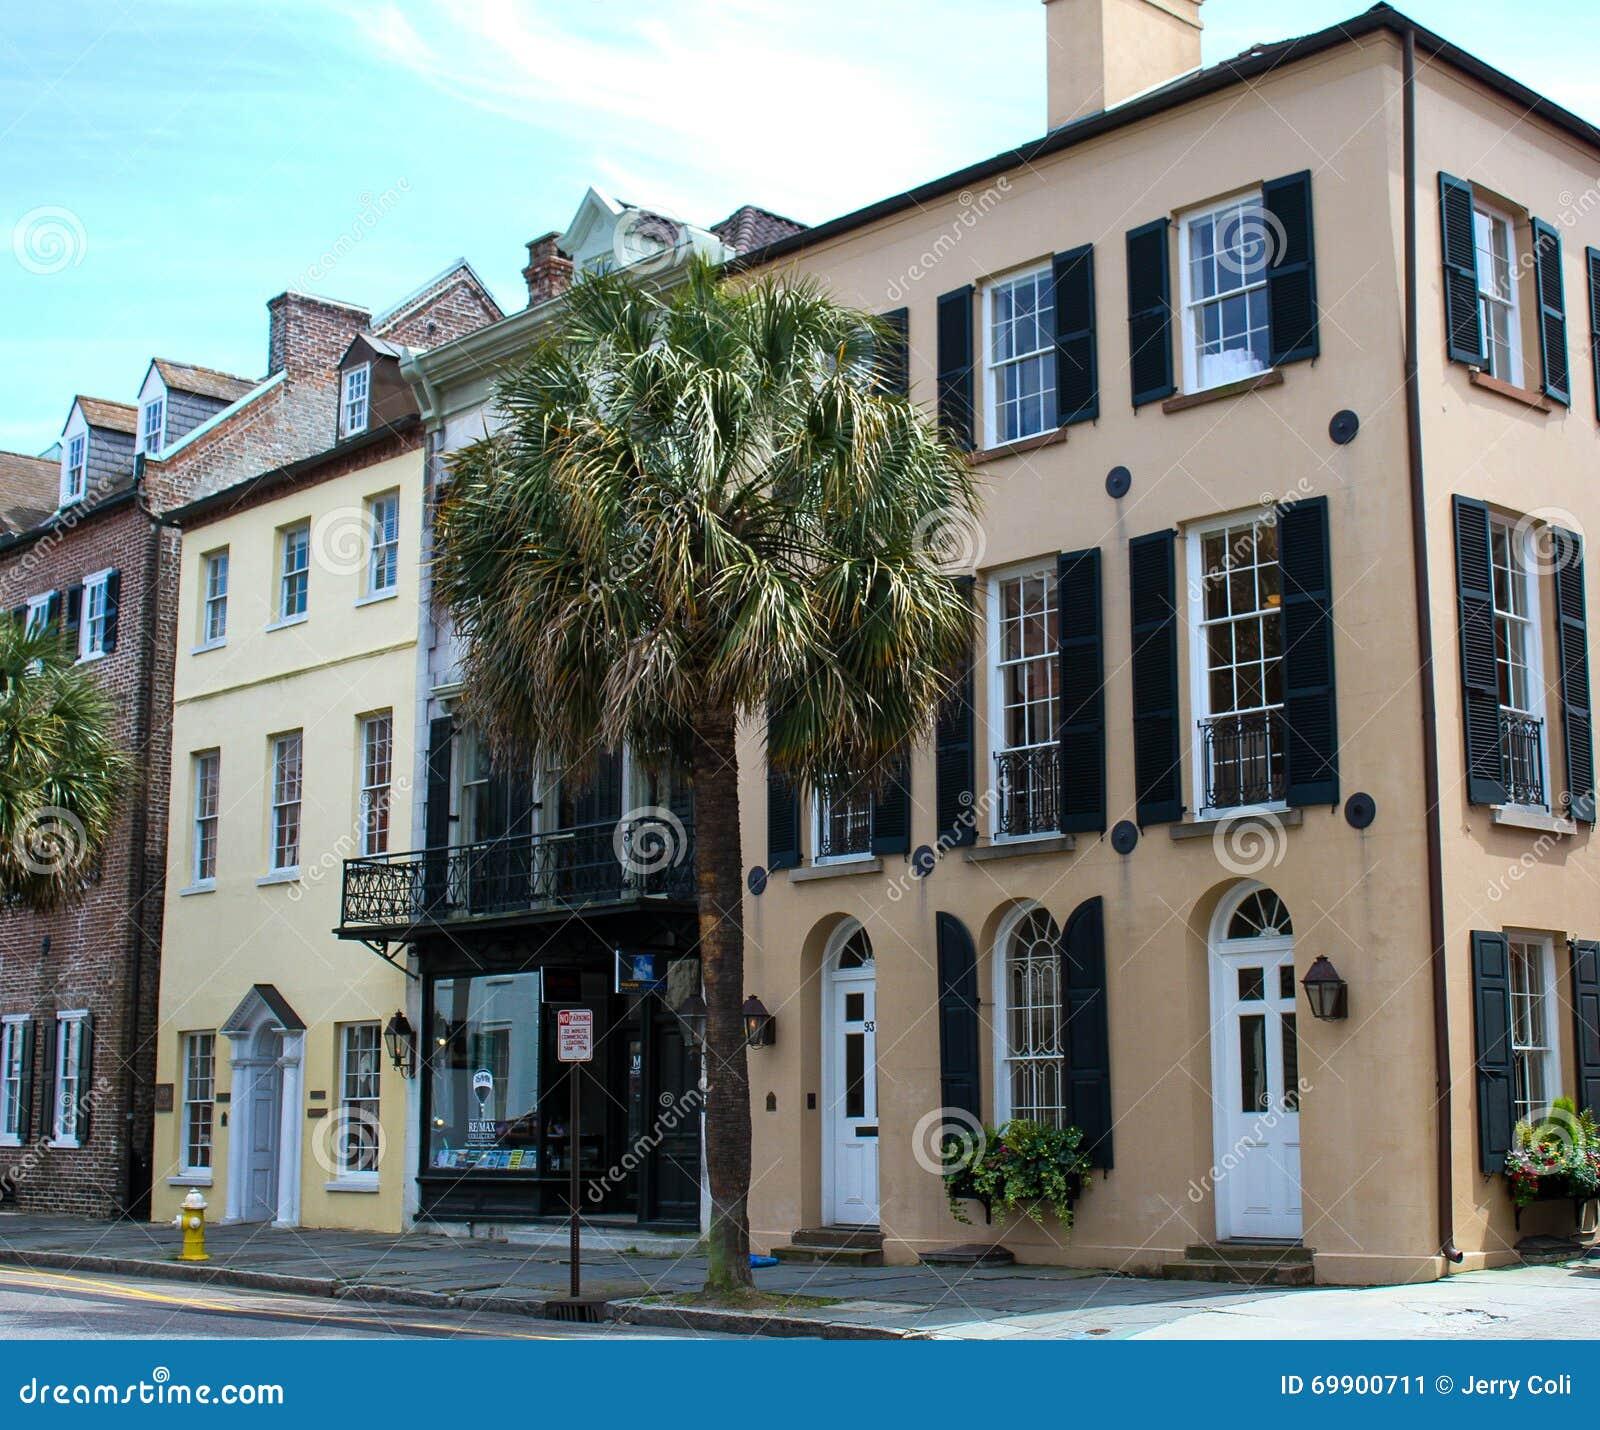 Charleston Sc Homes: Broad Street, Charleston, SC. Editorial Photo